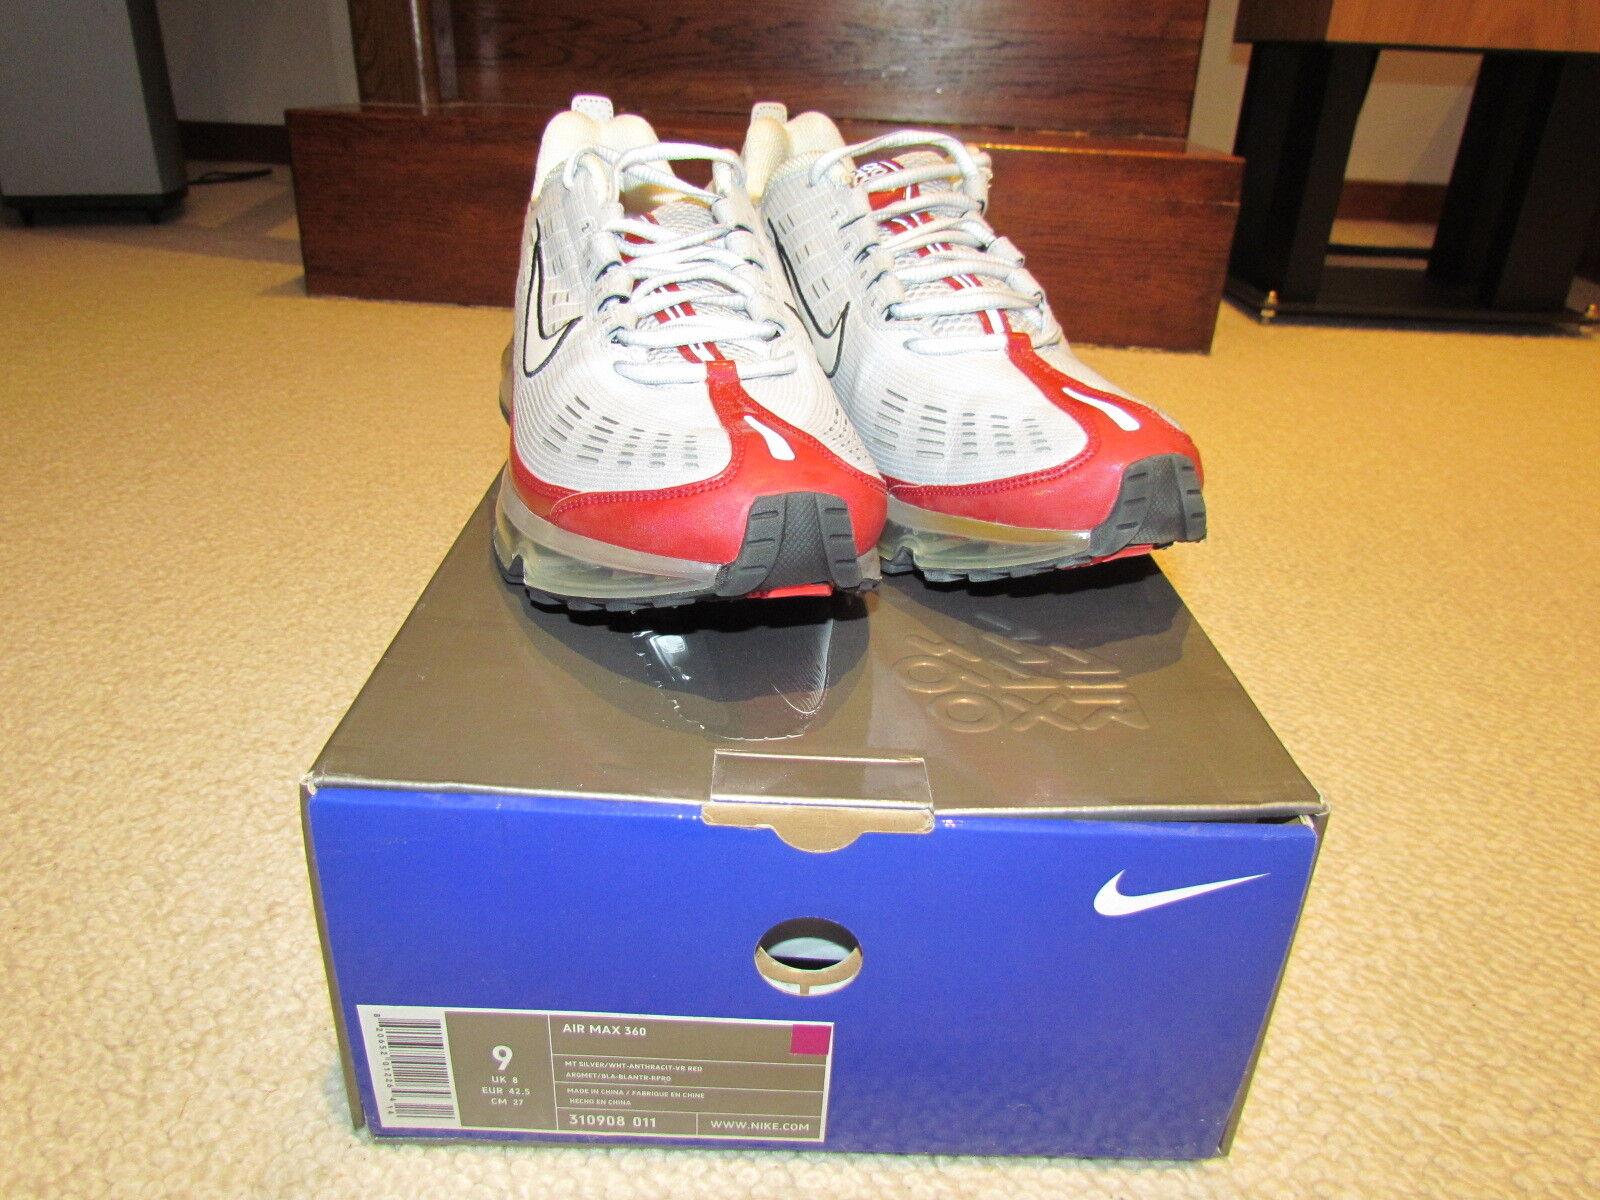 b82eaf02c6 Max 360 DS US 9 HOH rare Air pasvae58-Athletic Shoes - www ...